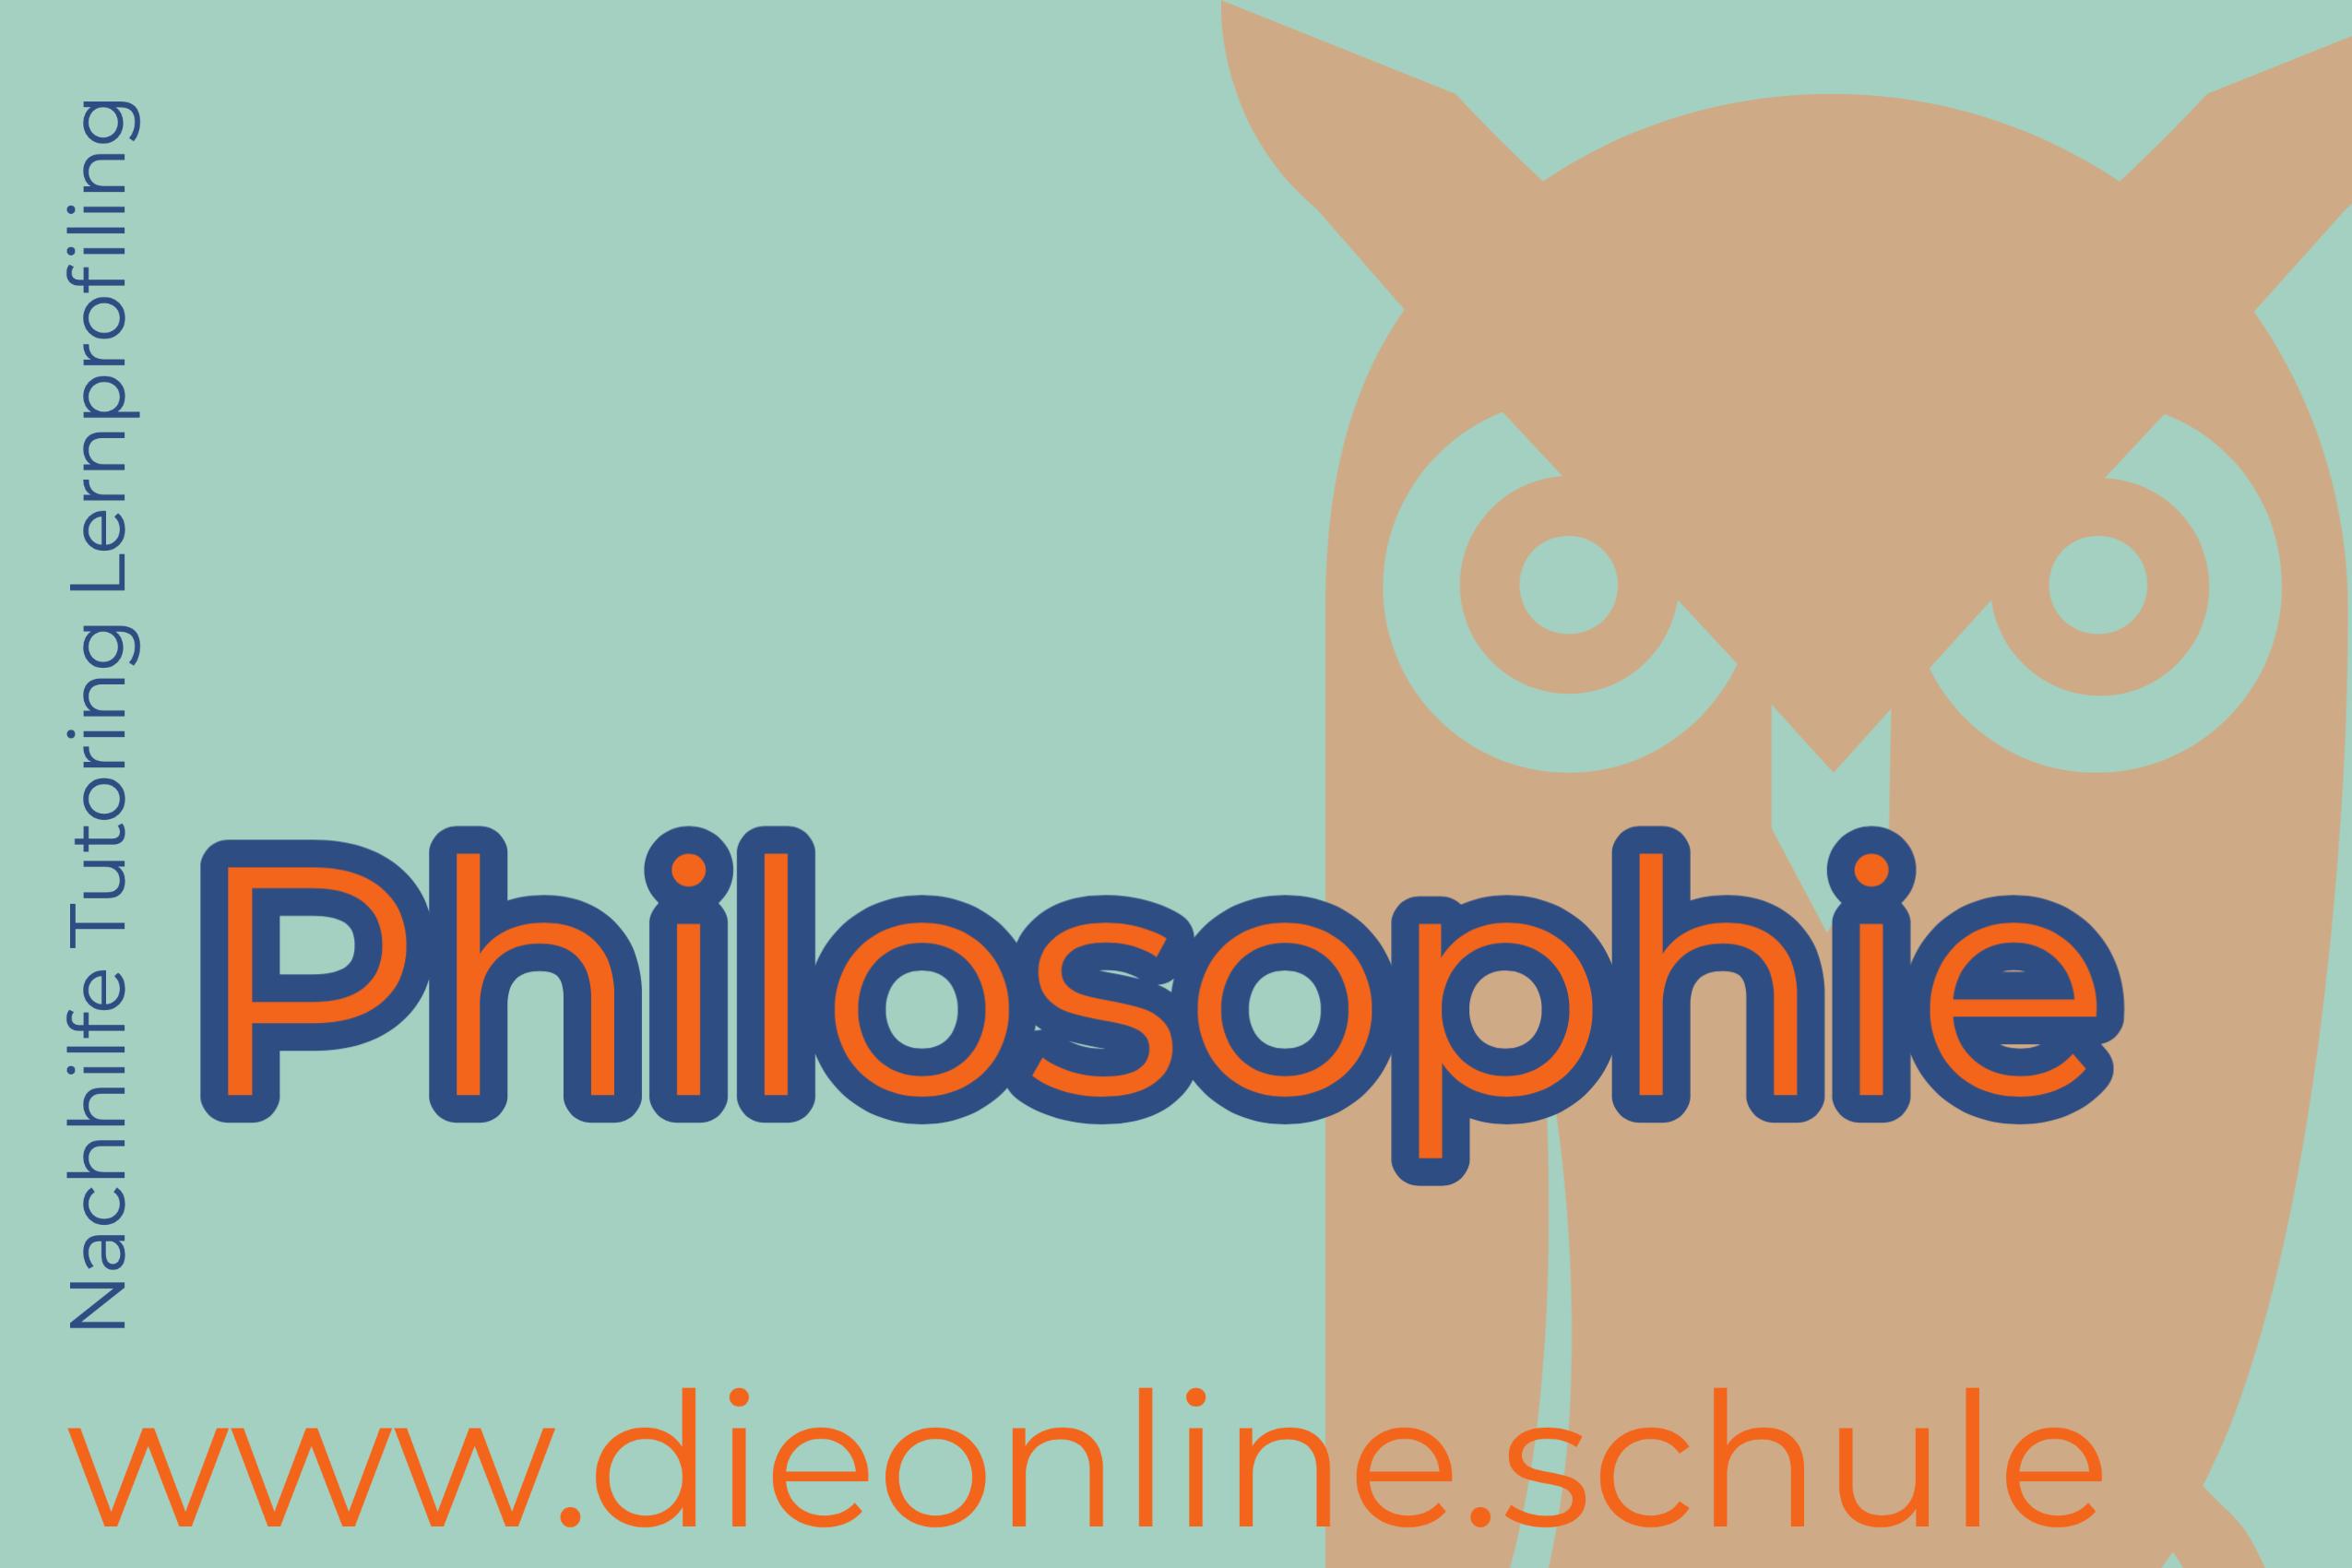 philosophie ethik Wirklichkeit marx Übung Hobbes rousseau philosophie staatsphilosophie wirklichkeit watzlawik marx hobbes montesquieu